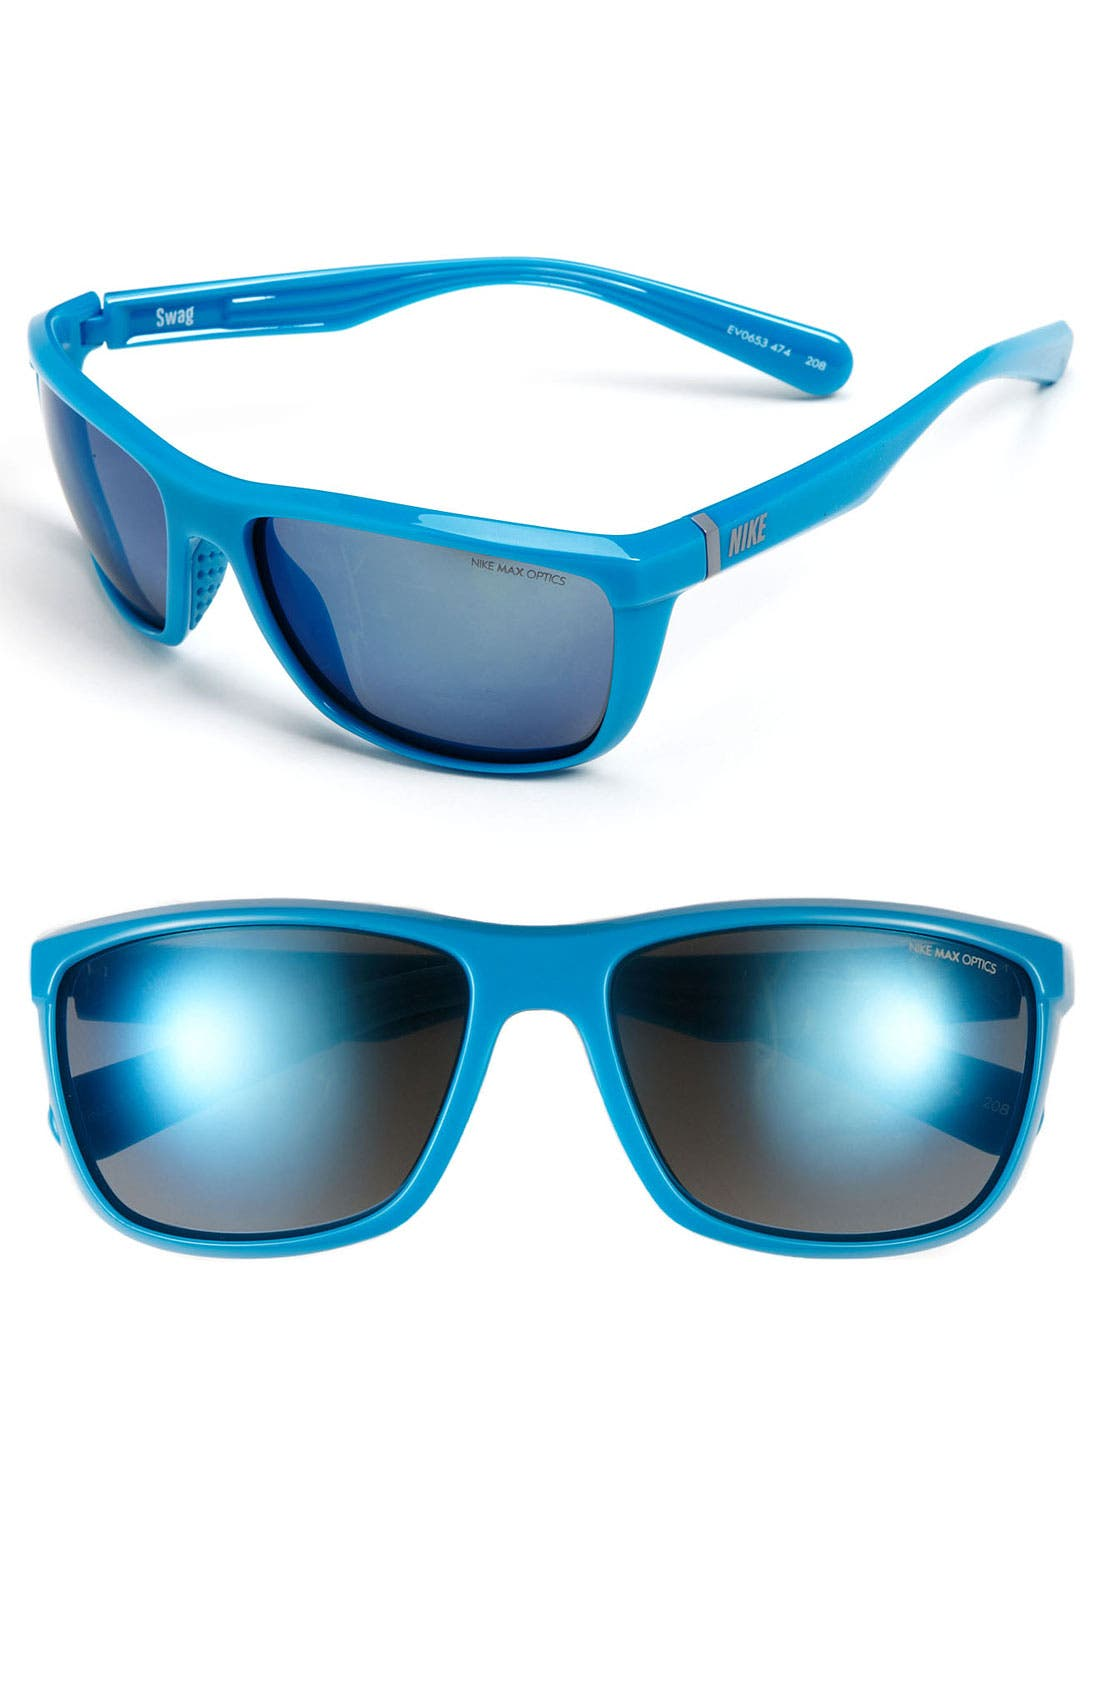 Alternate Image 1 Selected - Nike 'Swag' 60mm Sunglasses